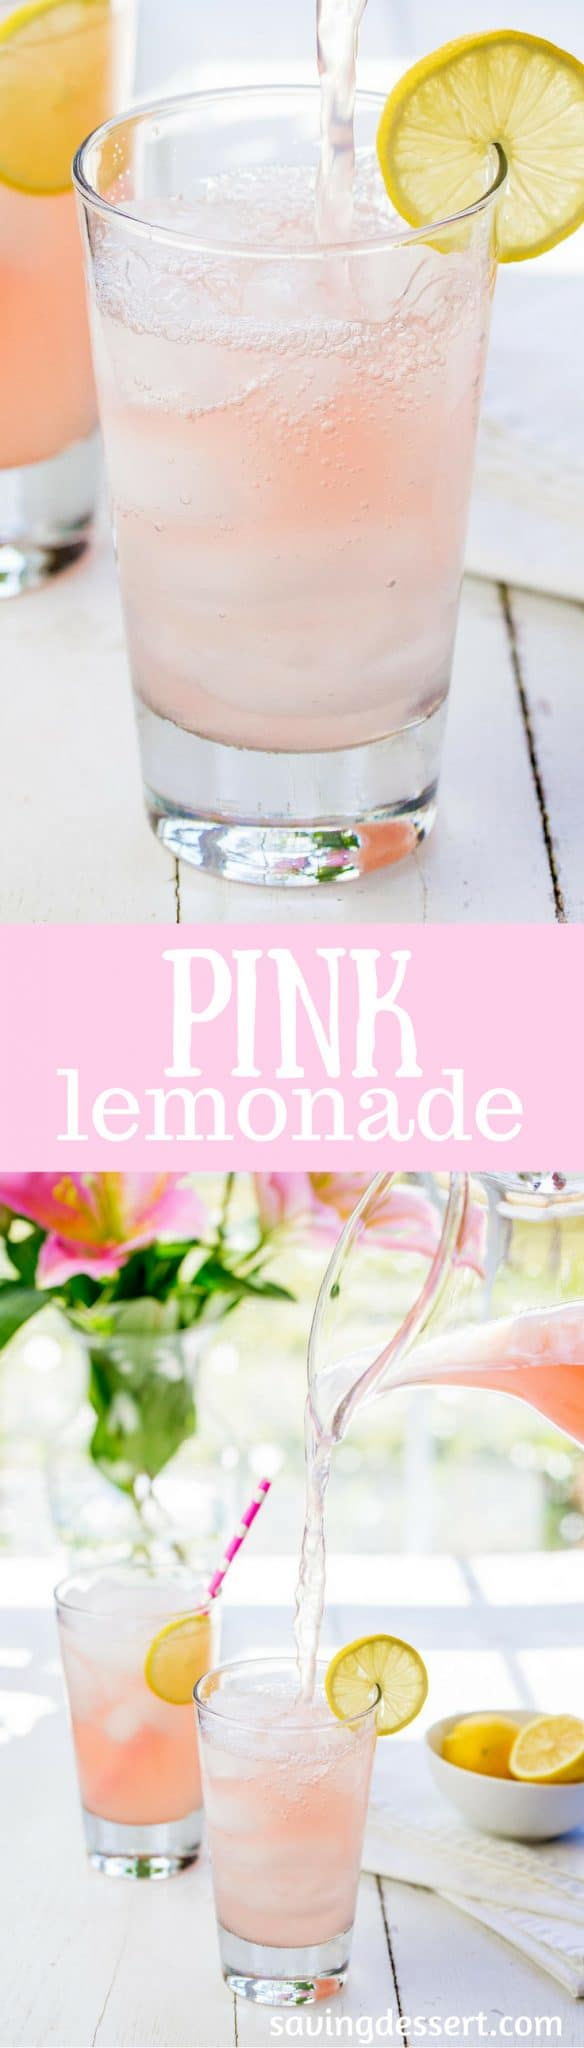 Pink Lemonade Recipe - Saving Room for Dessert